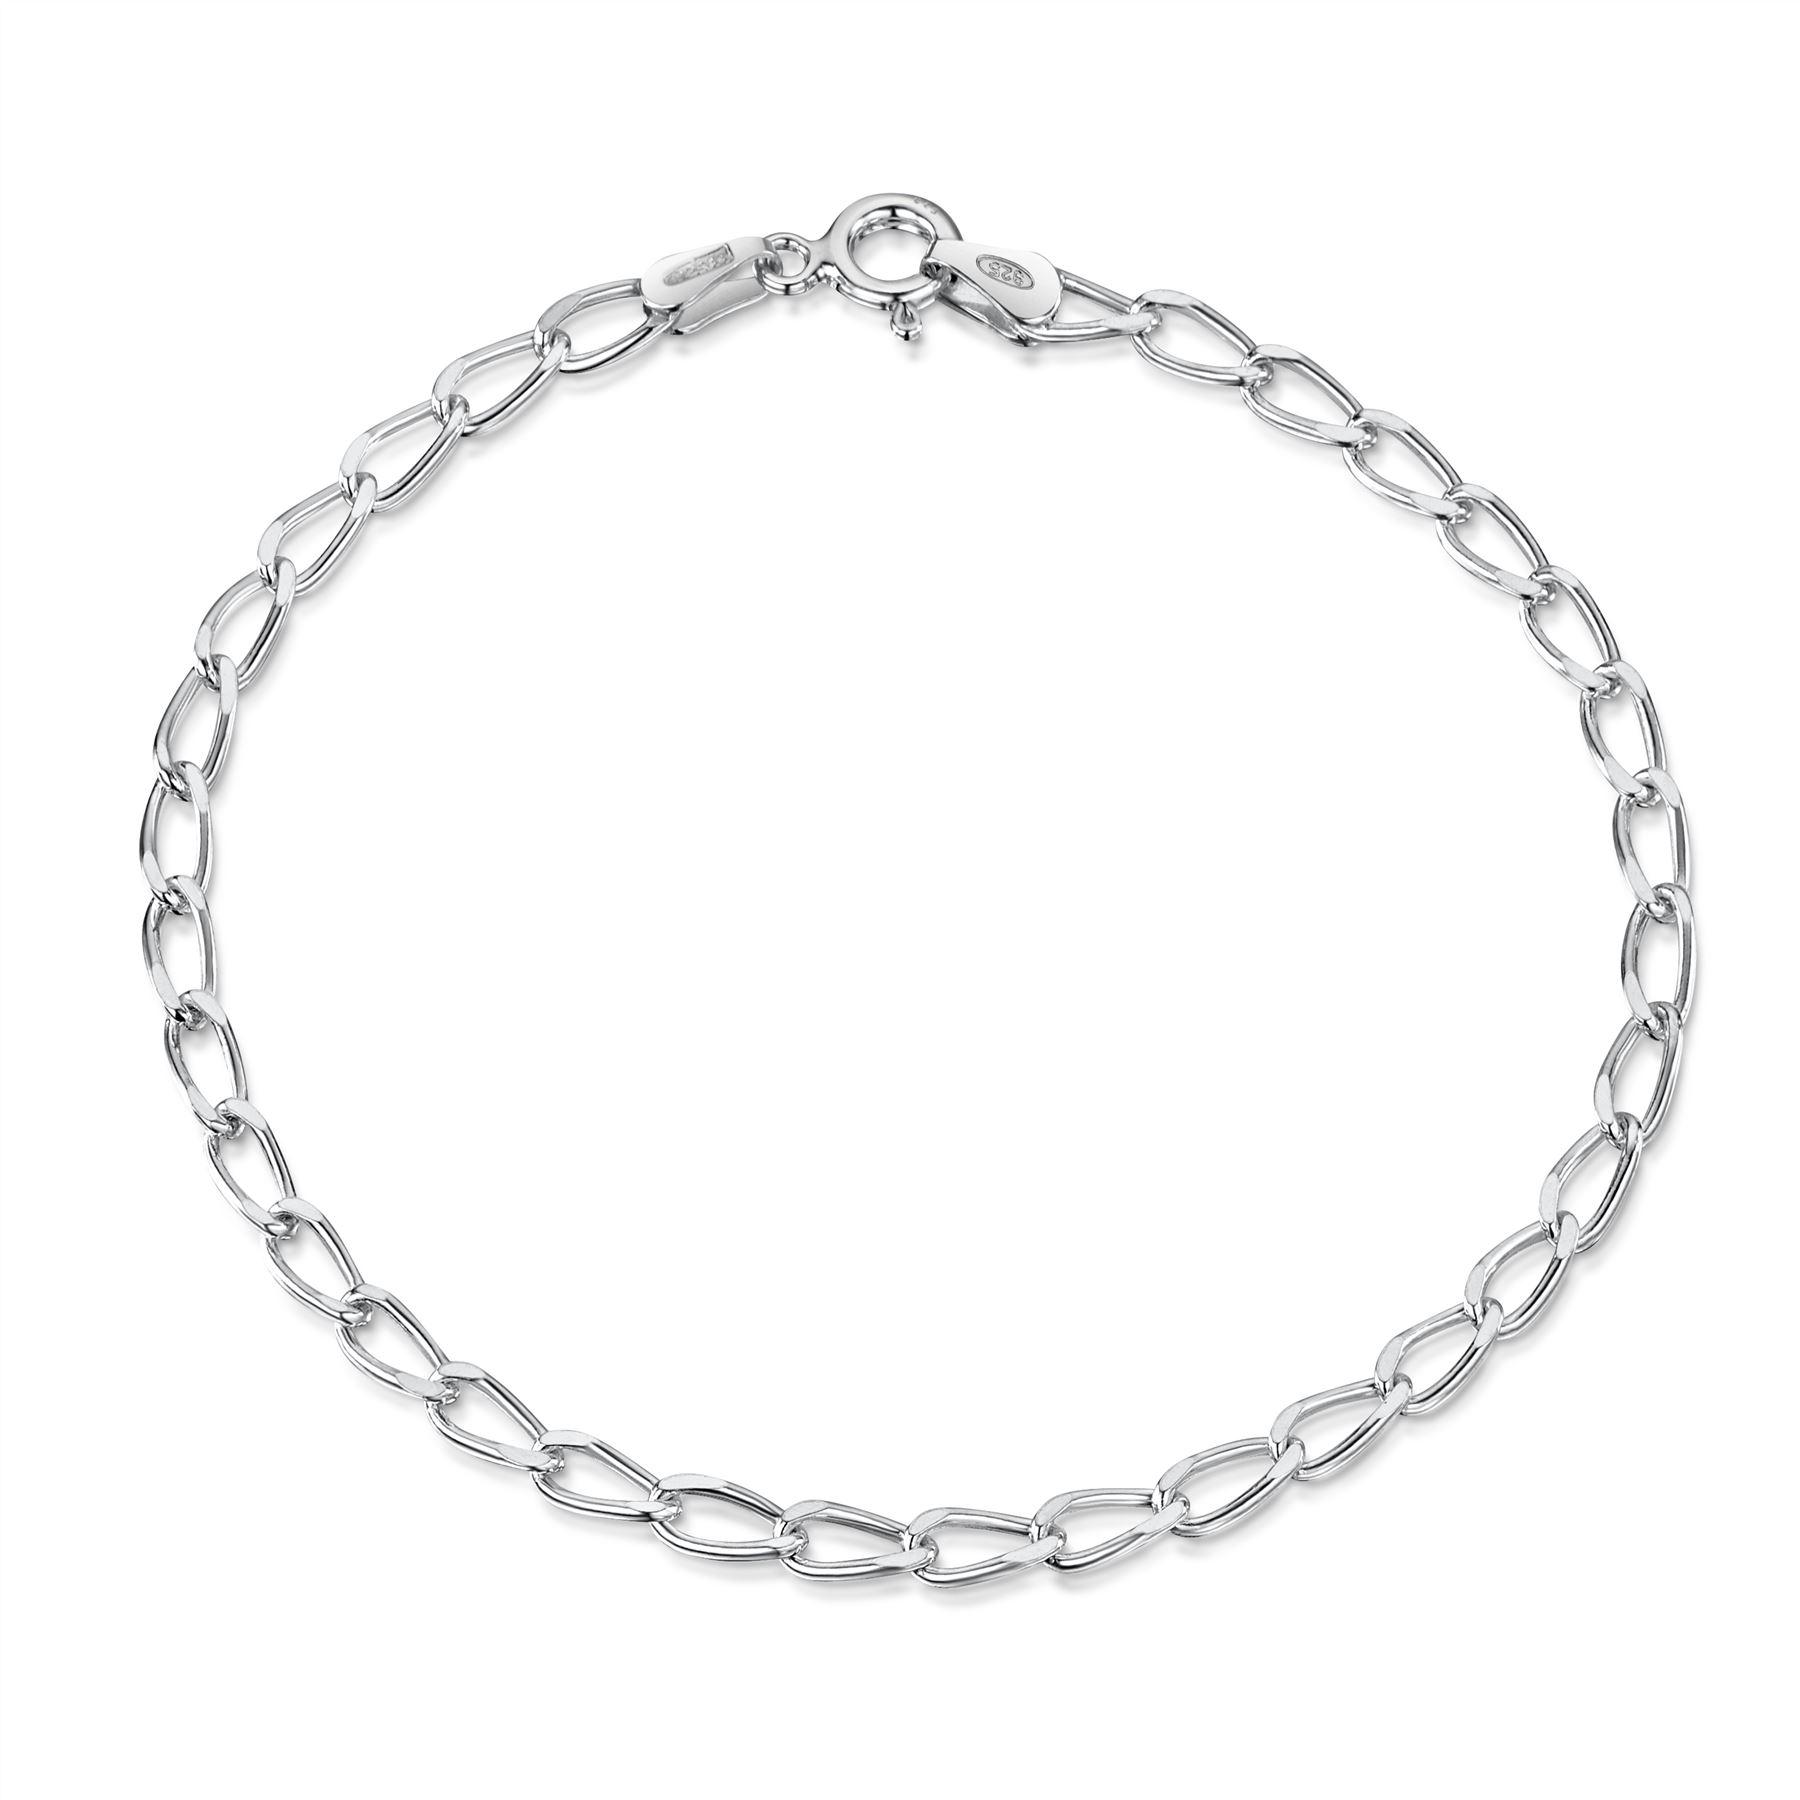 Amberta-Pulsera-en-Autentica-Plata-De-Ley-925-Brazalete-Precioso-para-Mujer miniatura 78